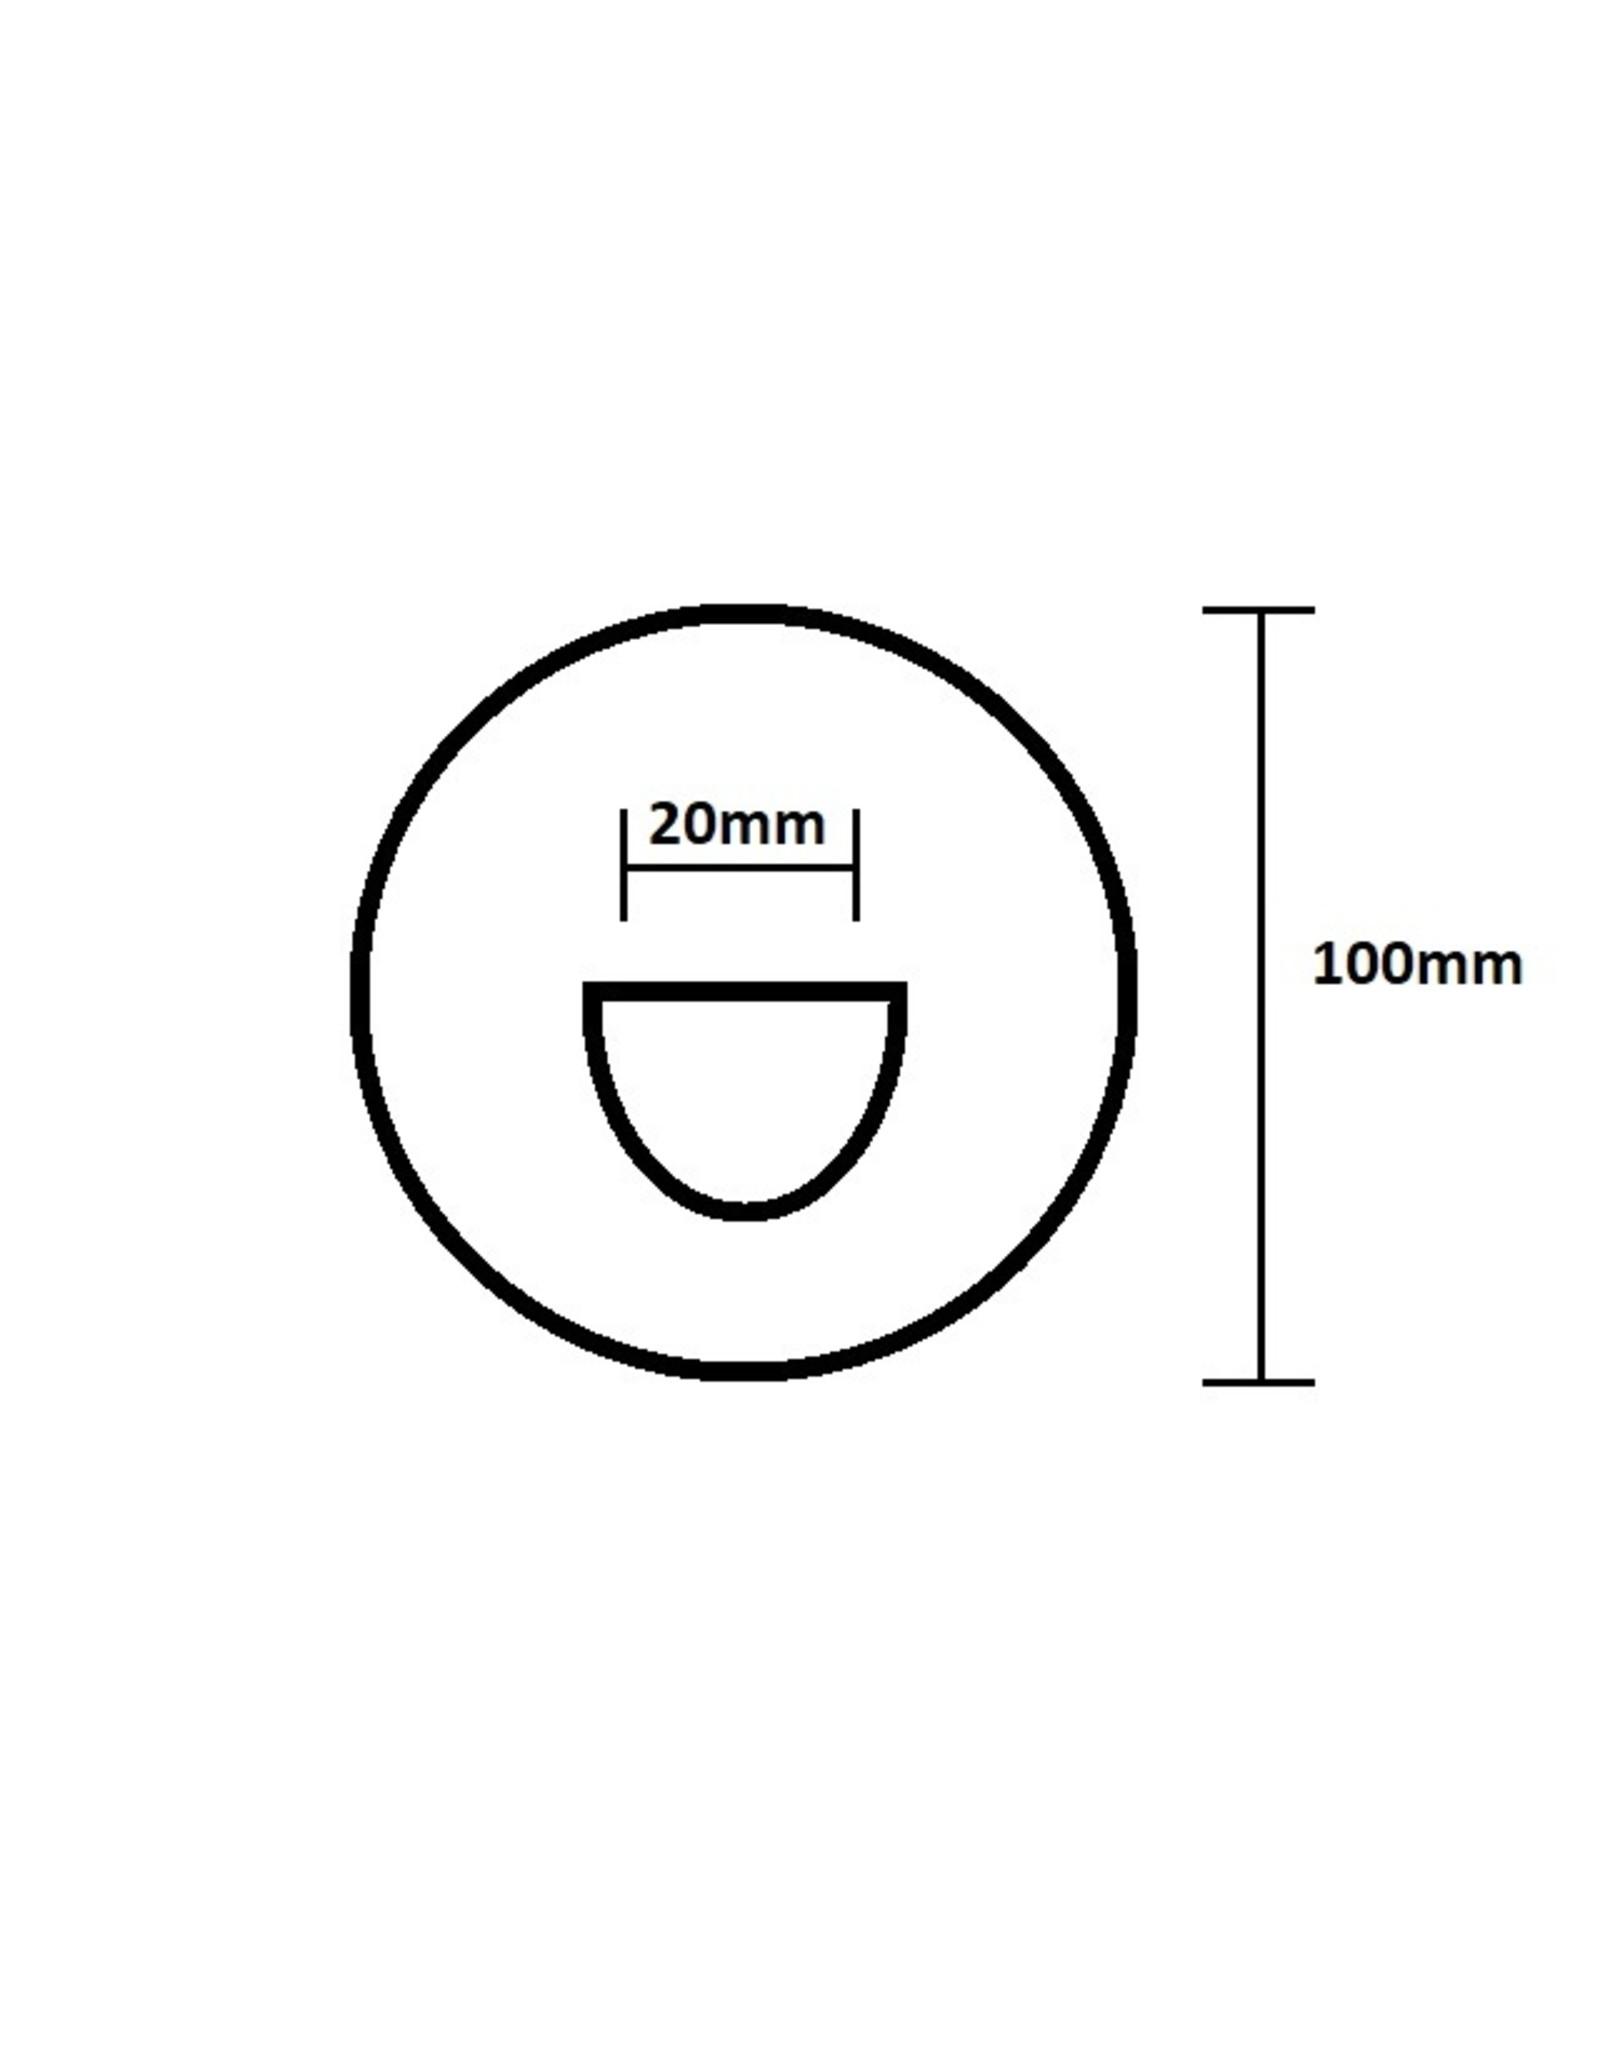 Hebor Watersport D-ring 20 mm klein Hypalon 10cm